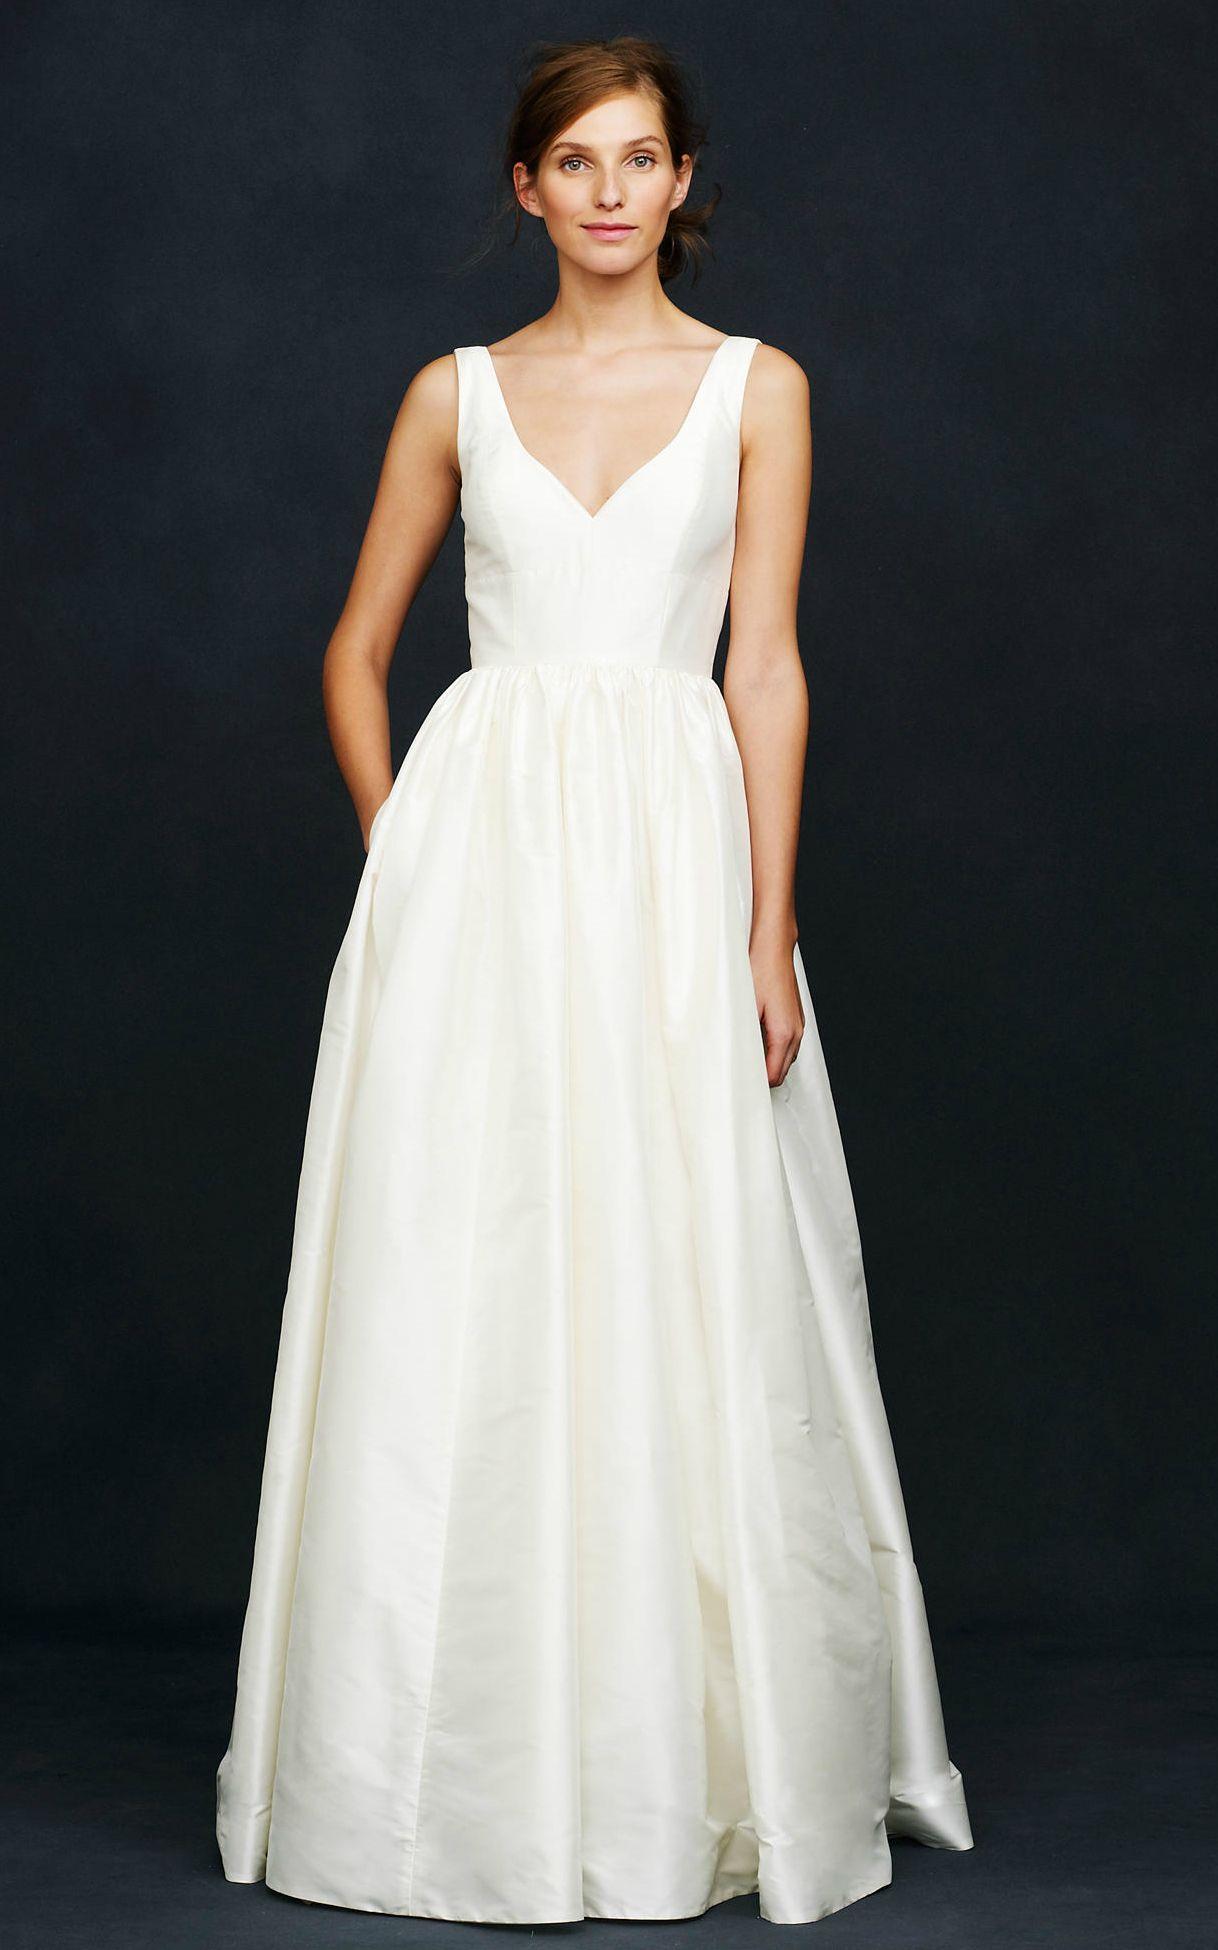 Jcrew wedding dress  Karlieu silk ballgown wedding dress with vneck from JCrew